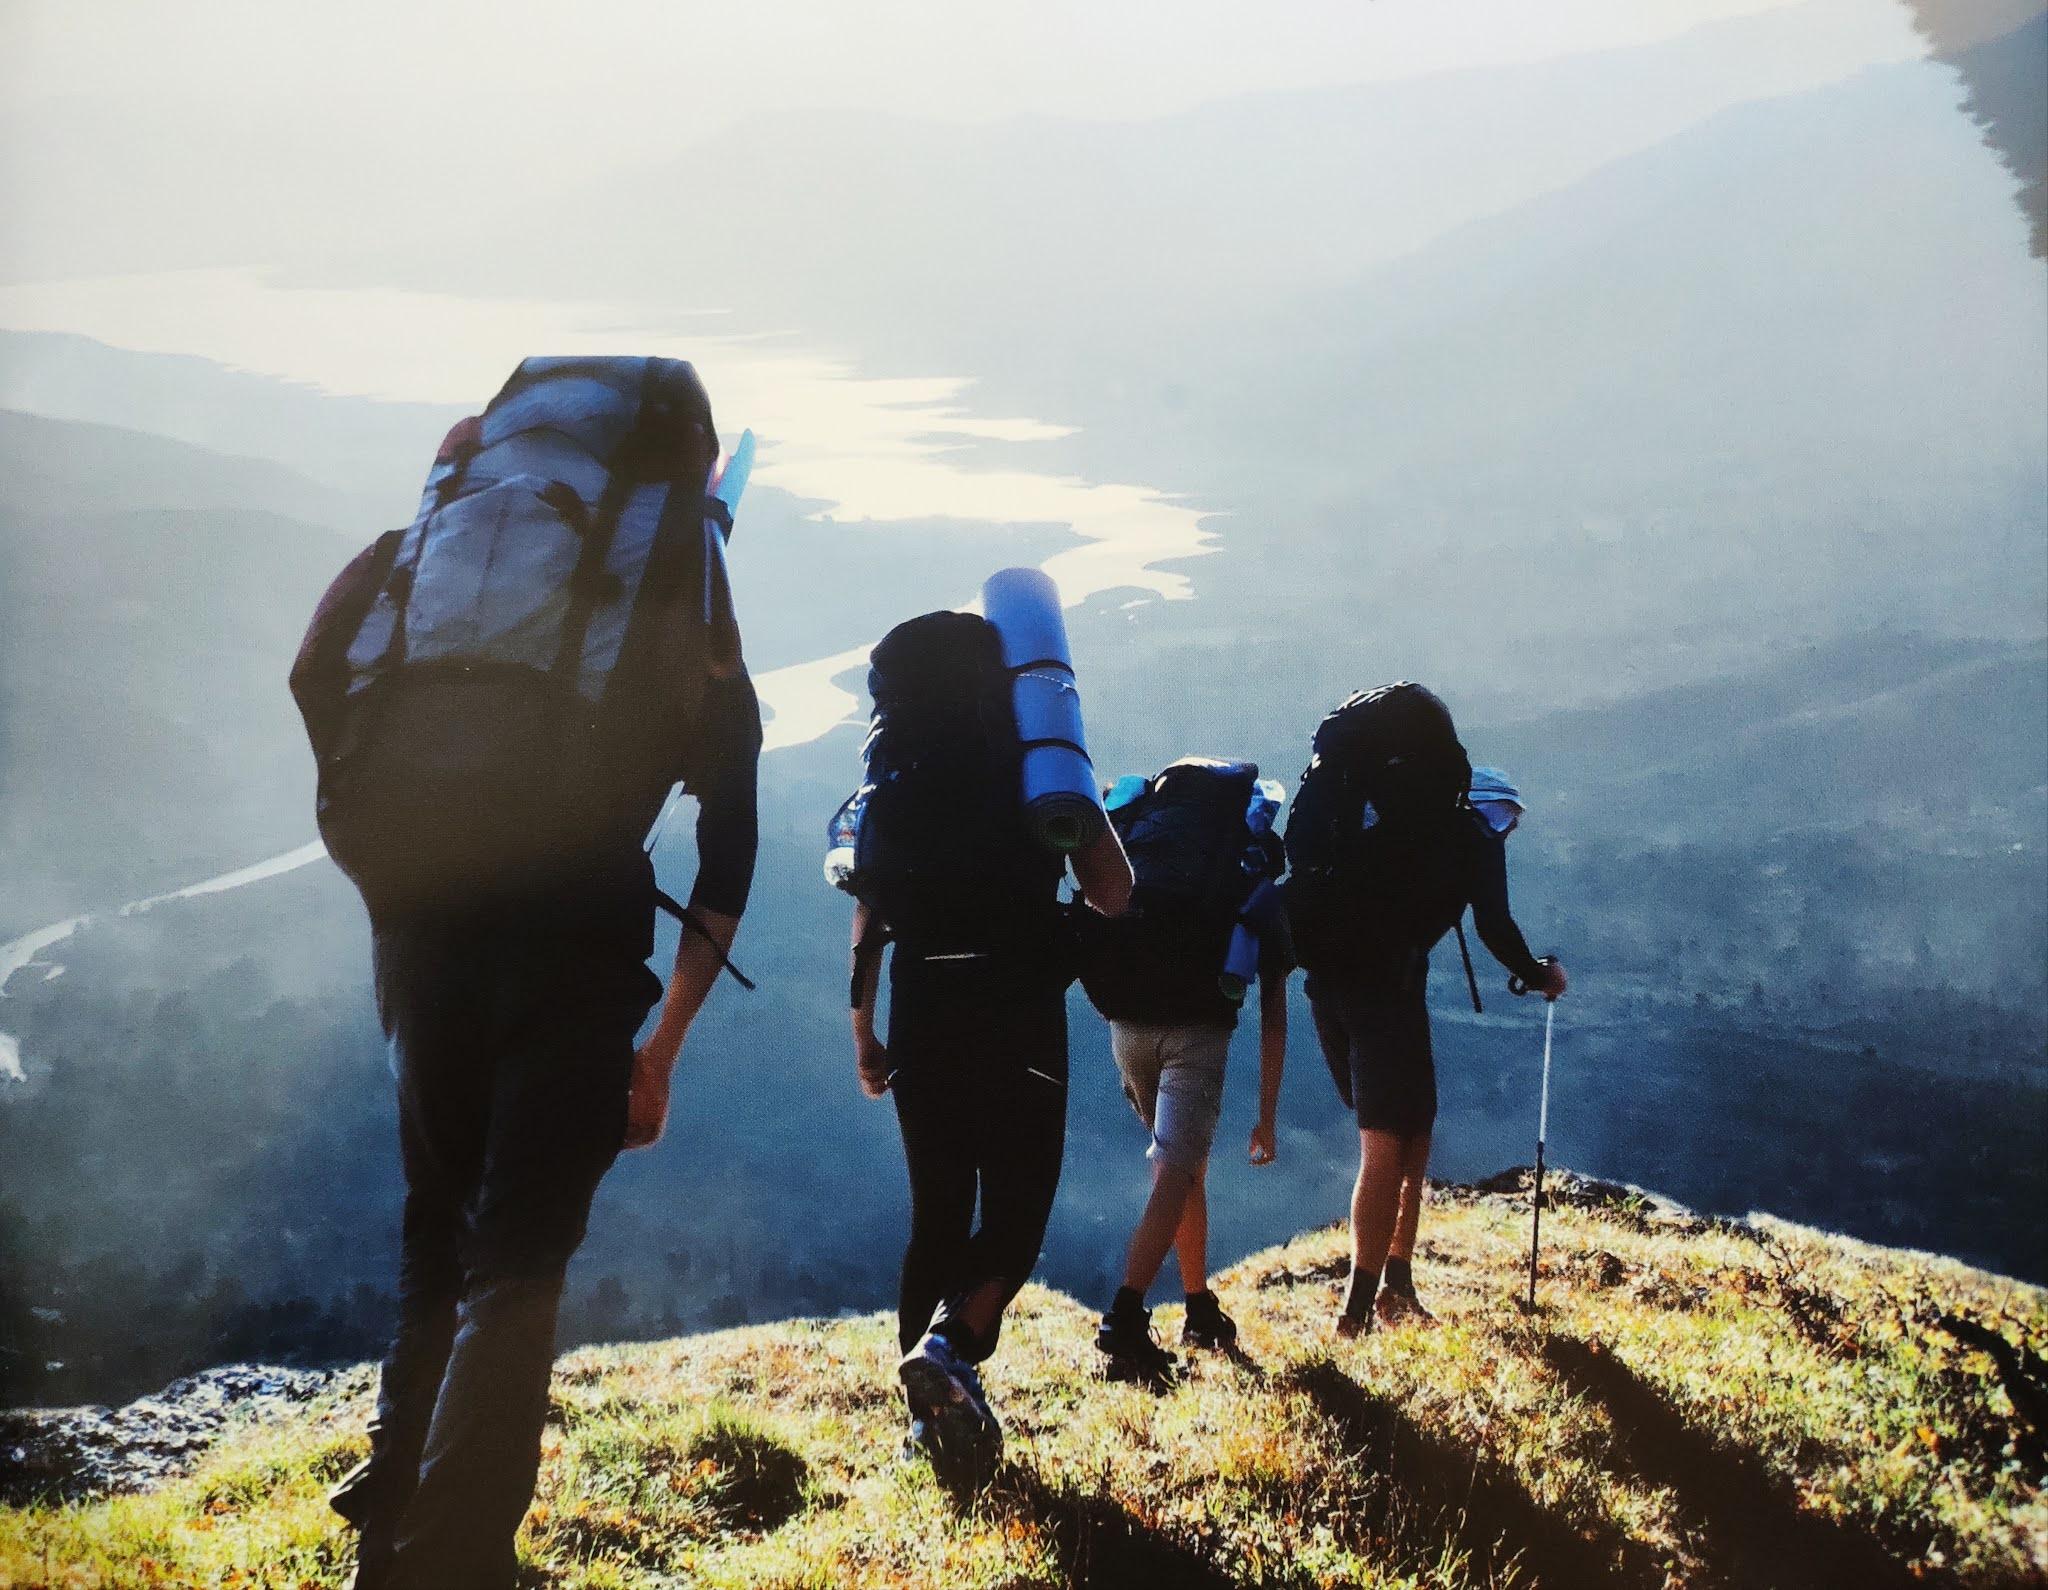 Image contains trekking guys